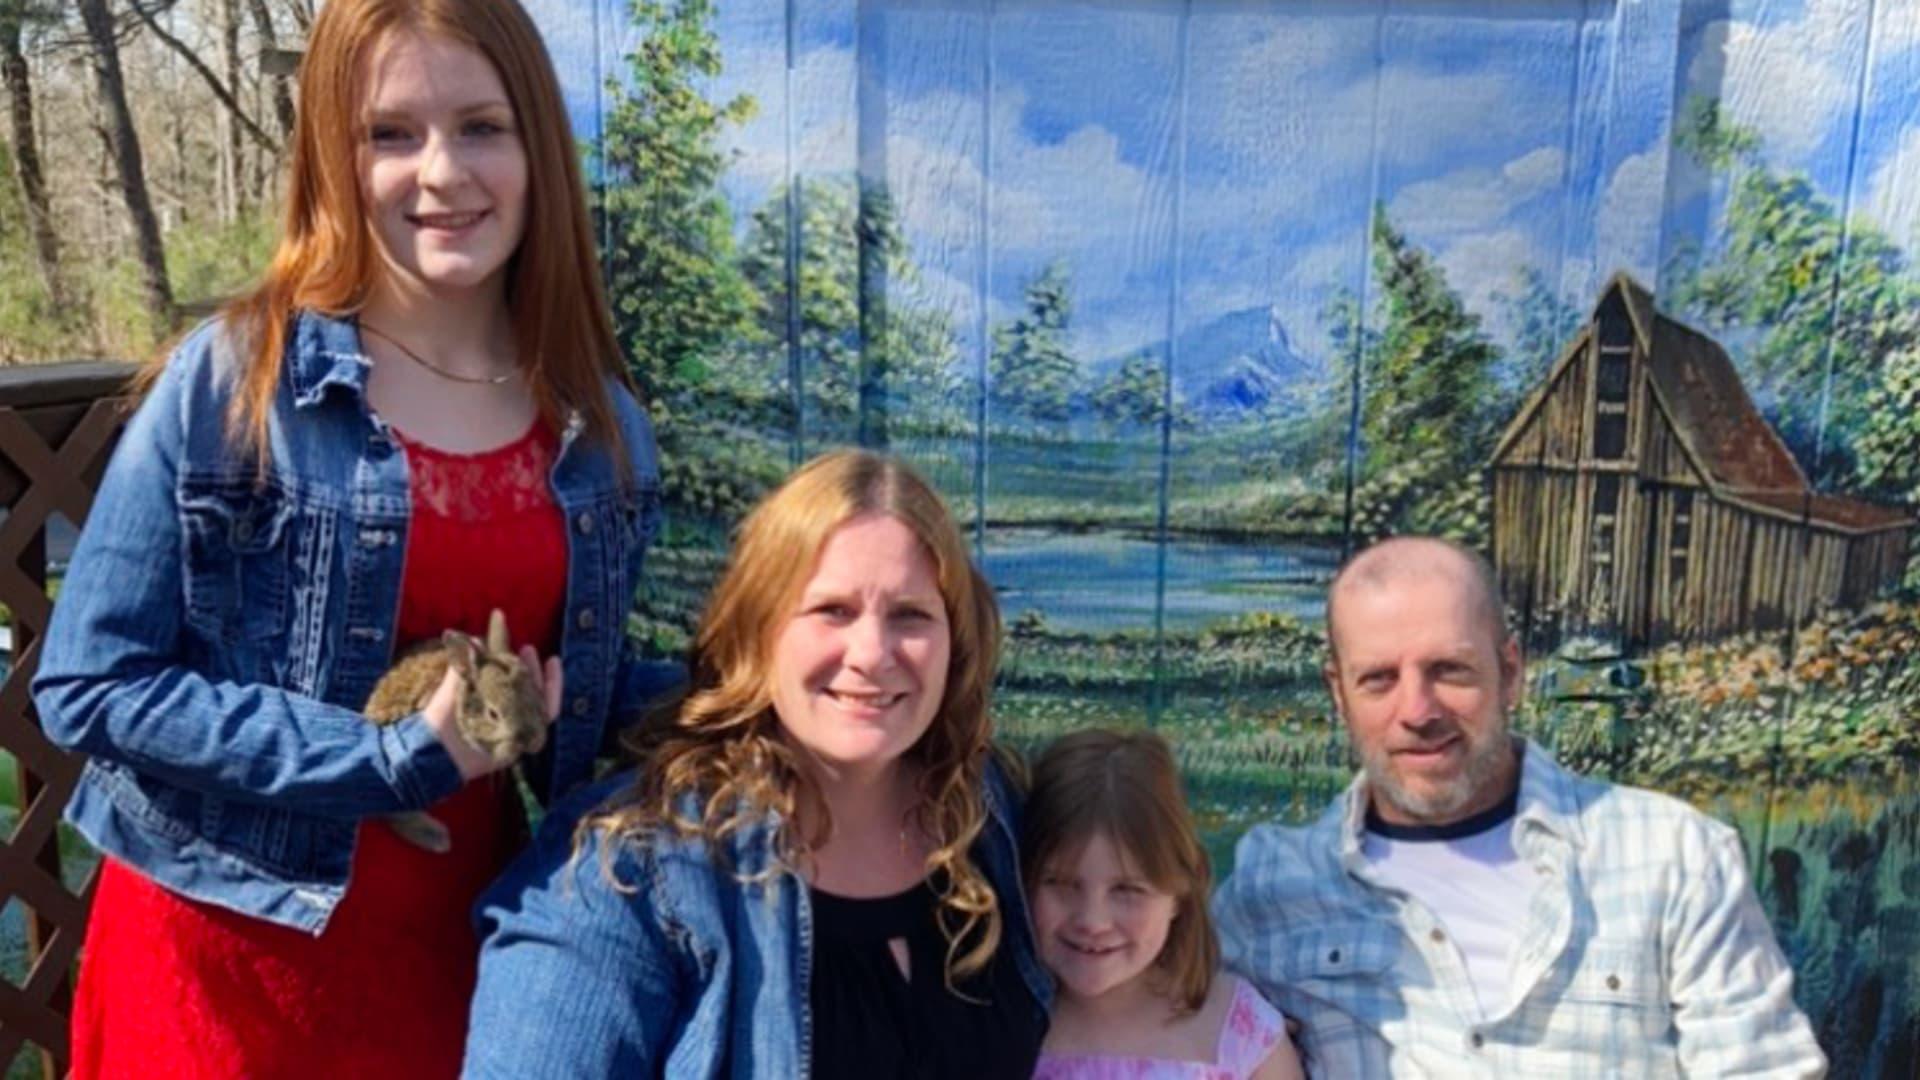 Sarah Rush, her daughters, Kylee, 15, and Adalyn, 6, and her husband Tim, 48.